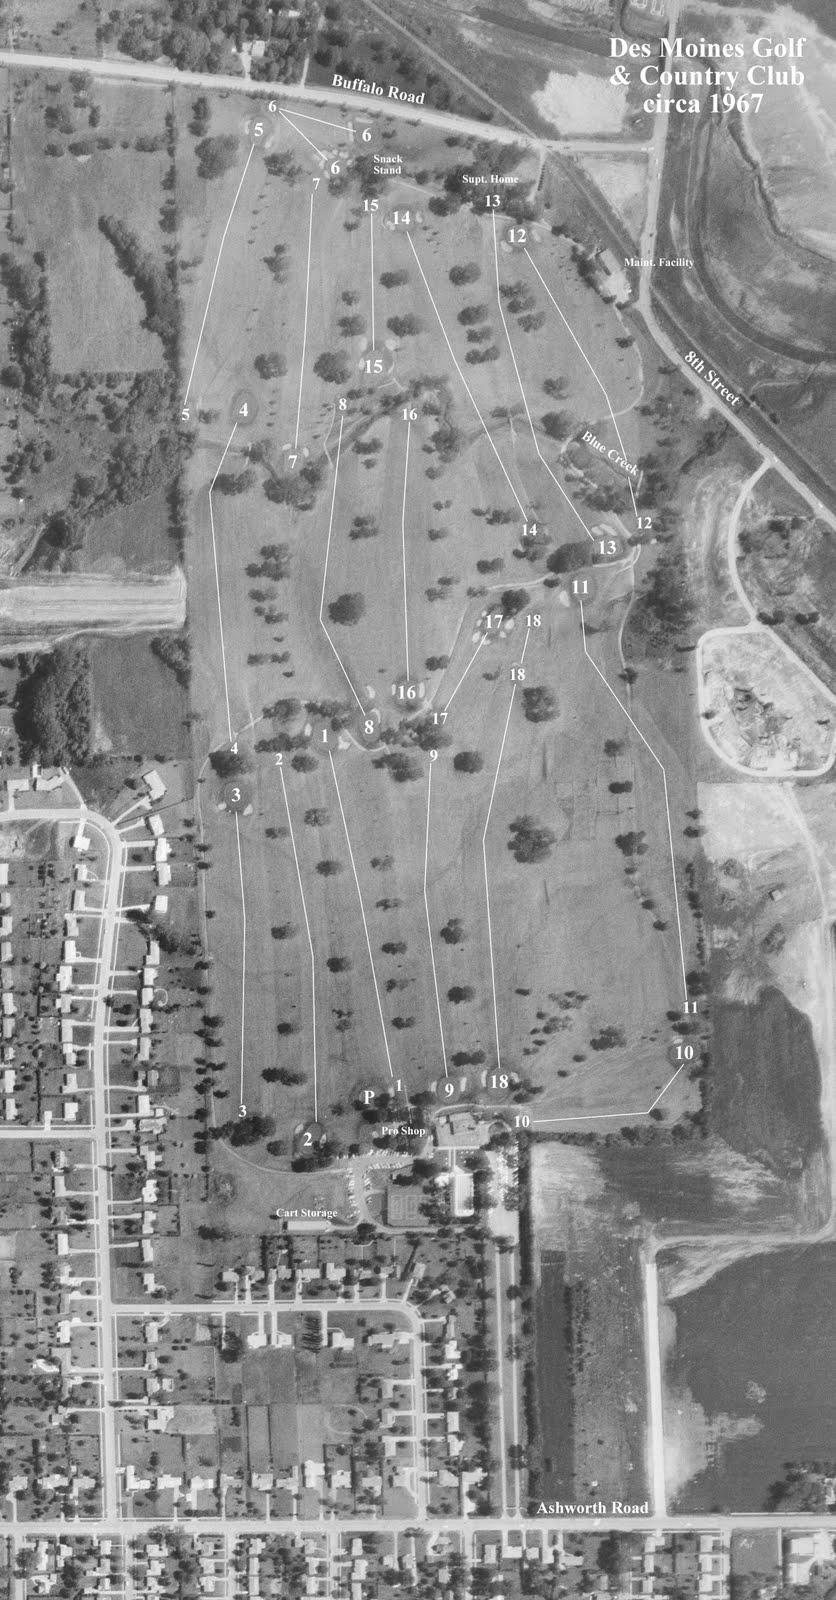 Dmgcc Golf Course Grounds Department November 2009